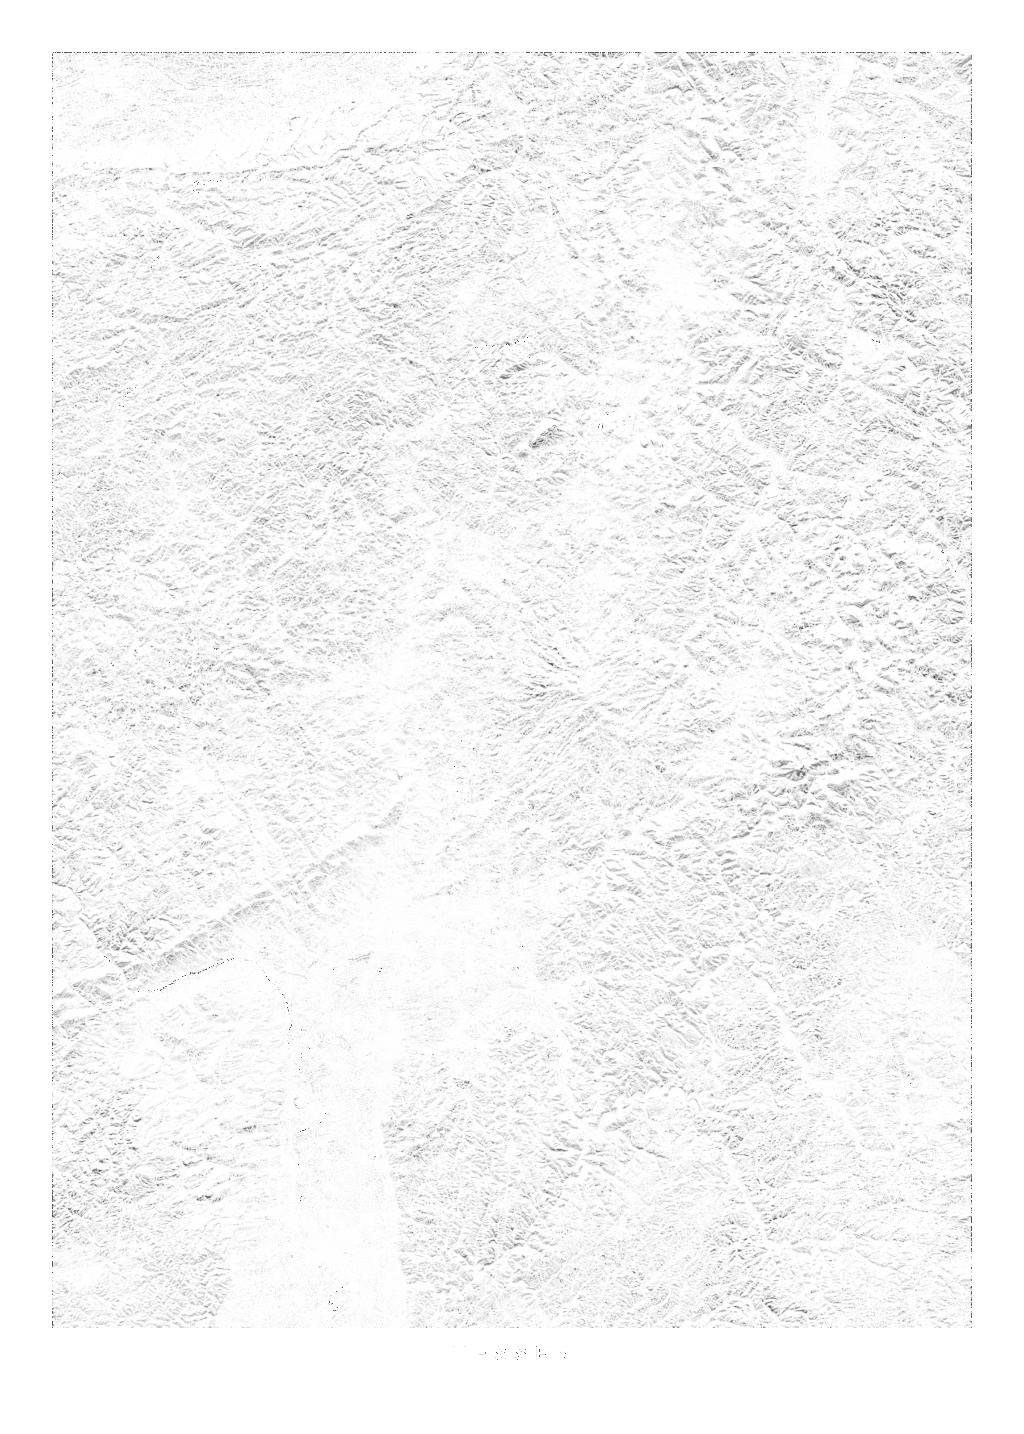 Hessen wall map